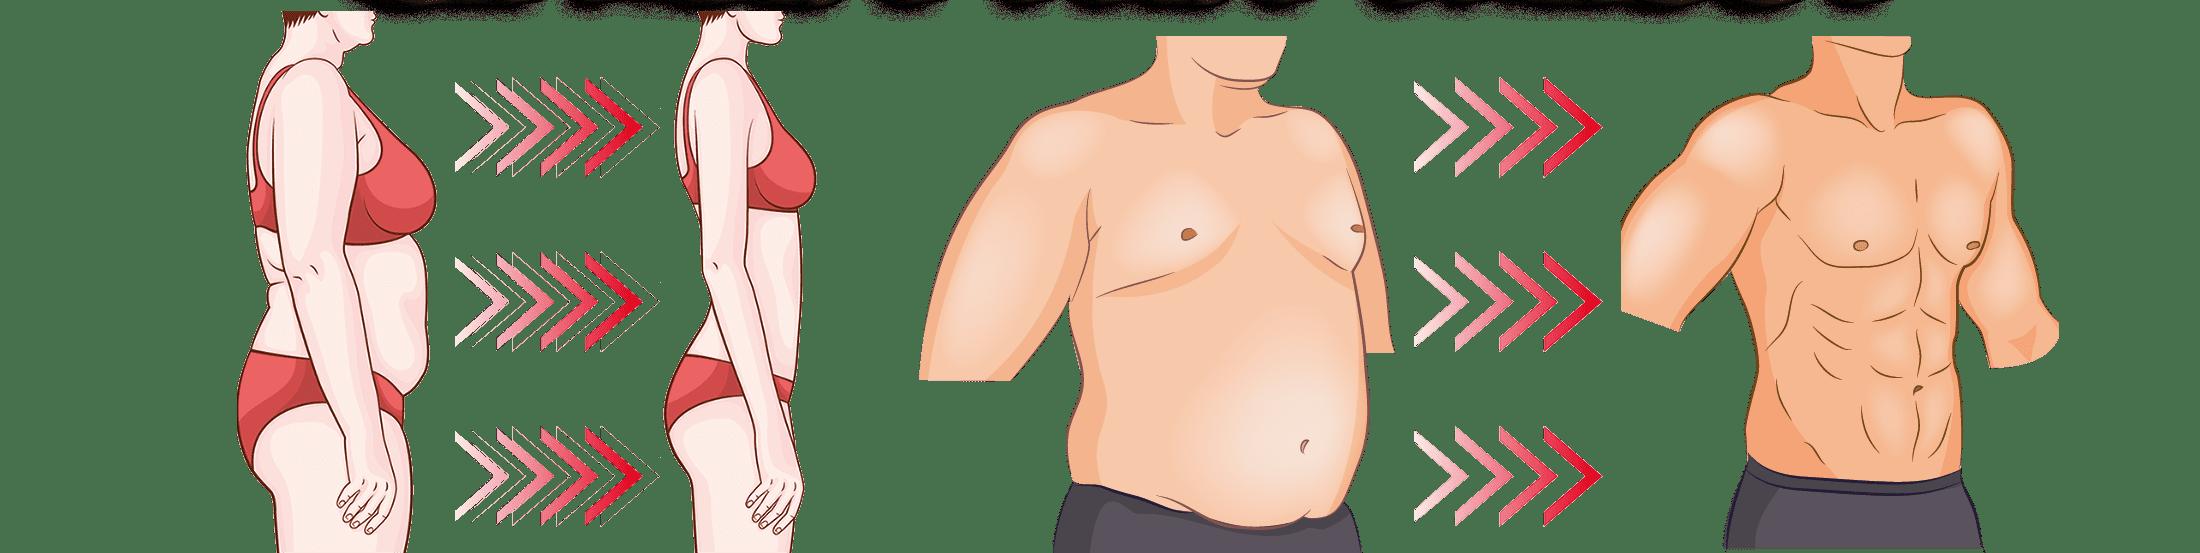 gå ner i vikt snabbt